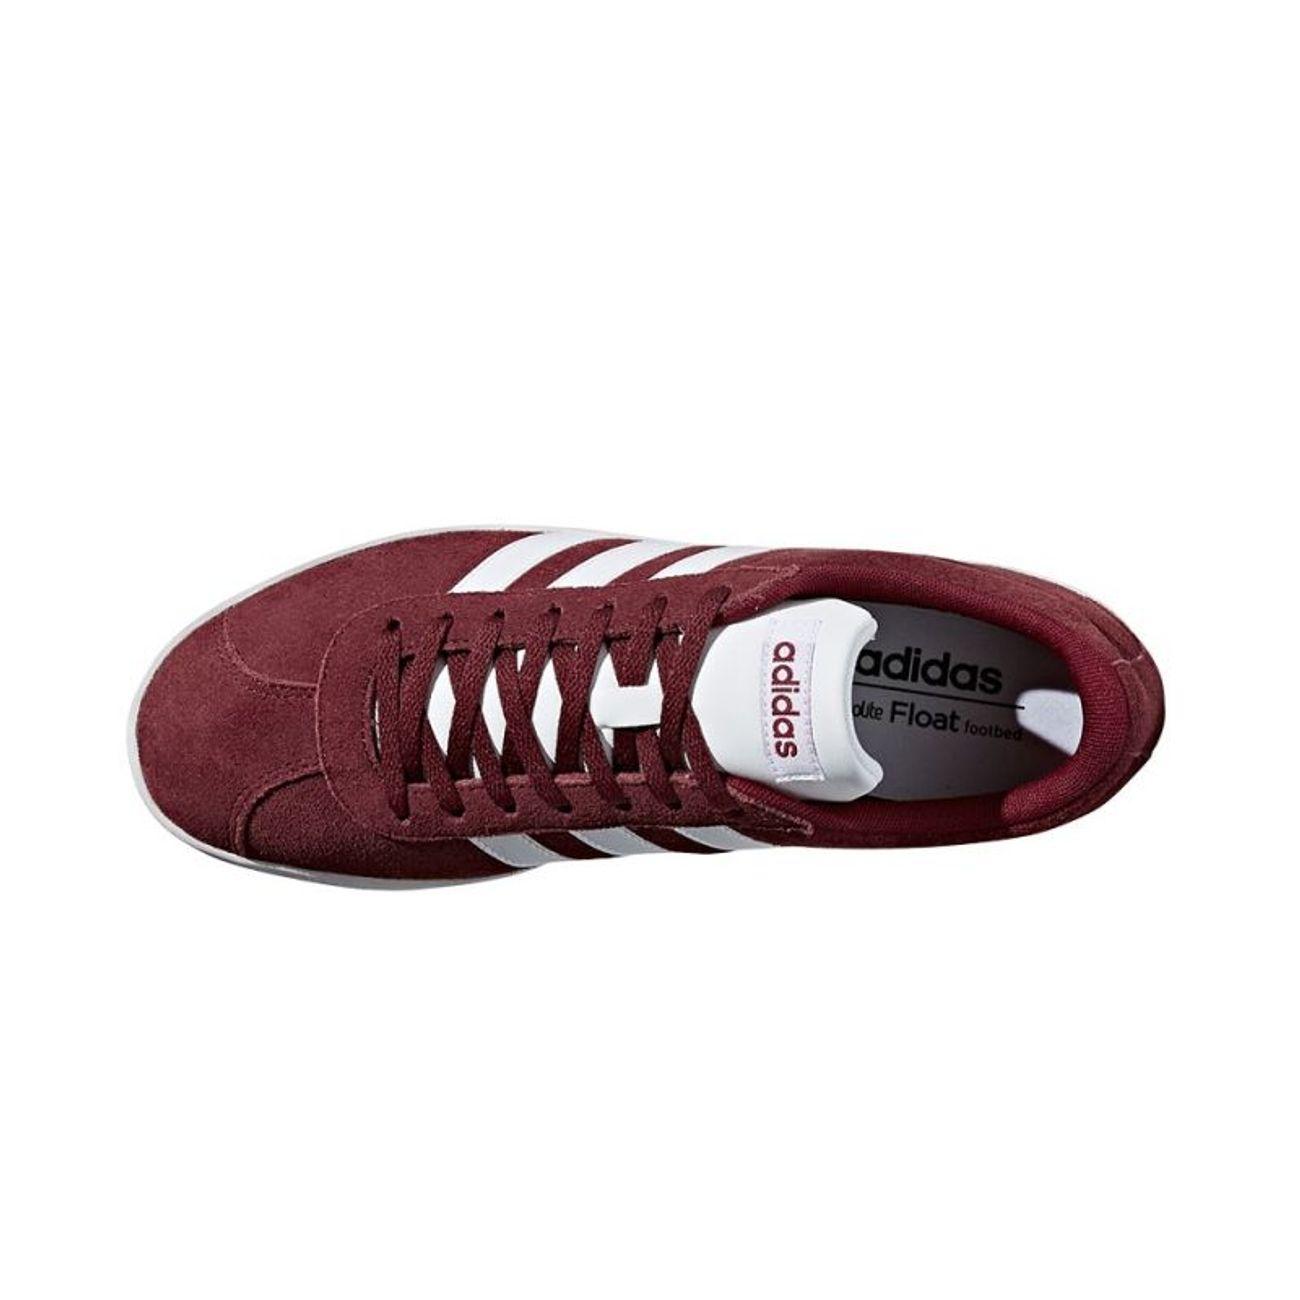 Mode Lifestyle homme ADIDAS NEO Adidas Neo Vl Court 2.0 bordeaux, baskets mode homme